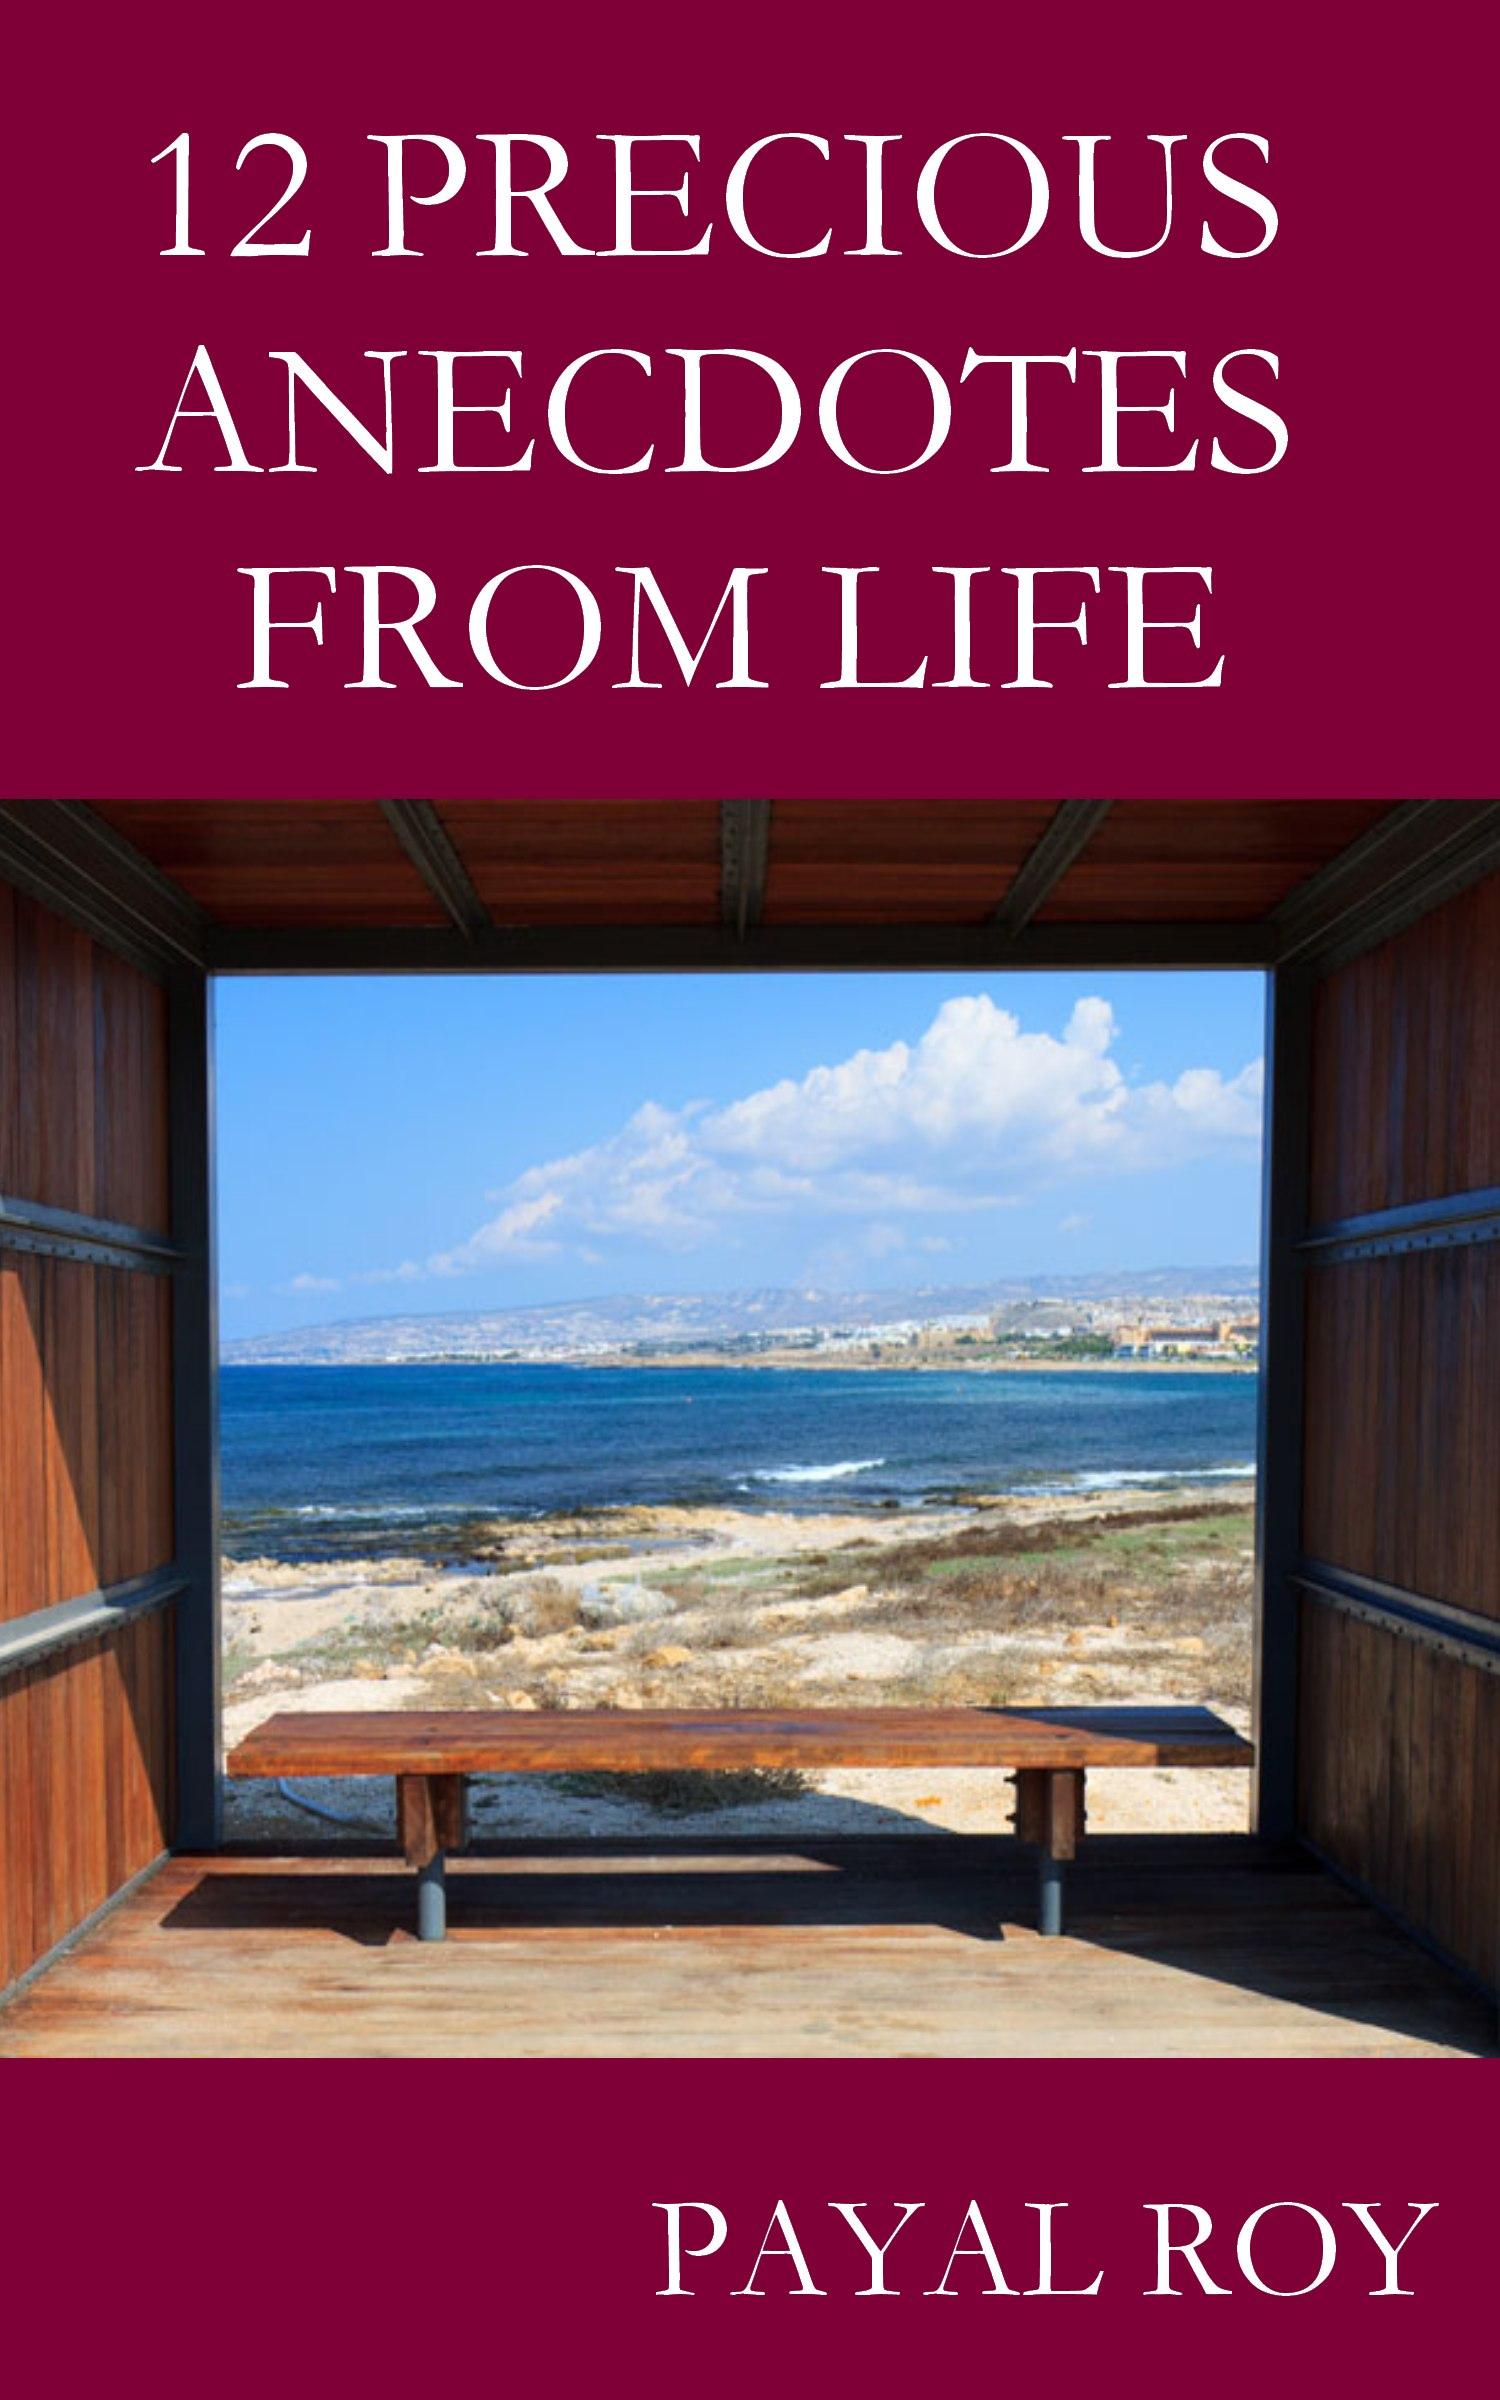 12 Precious Anecdotes From Life